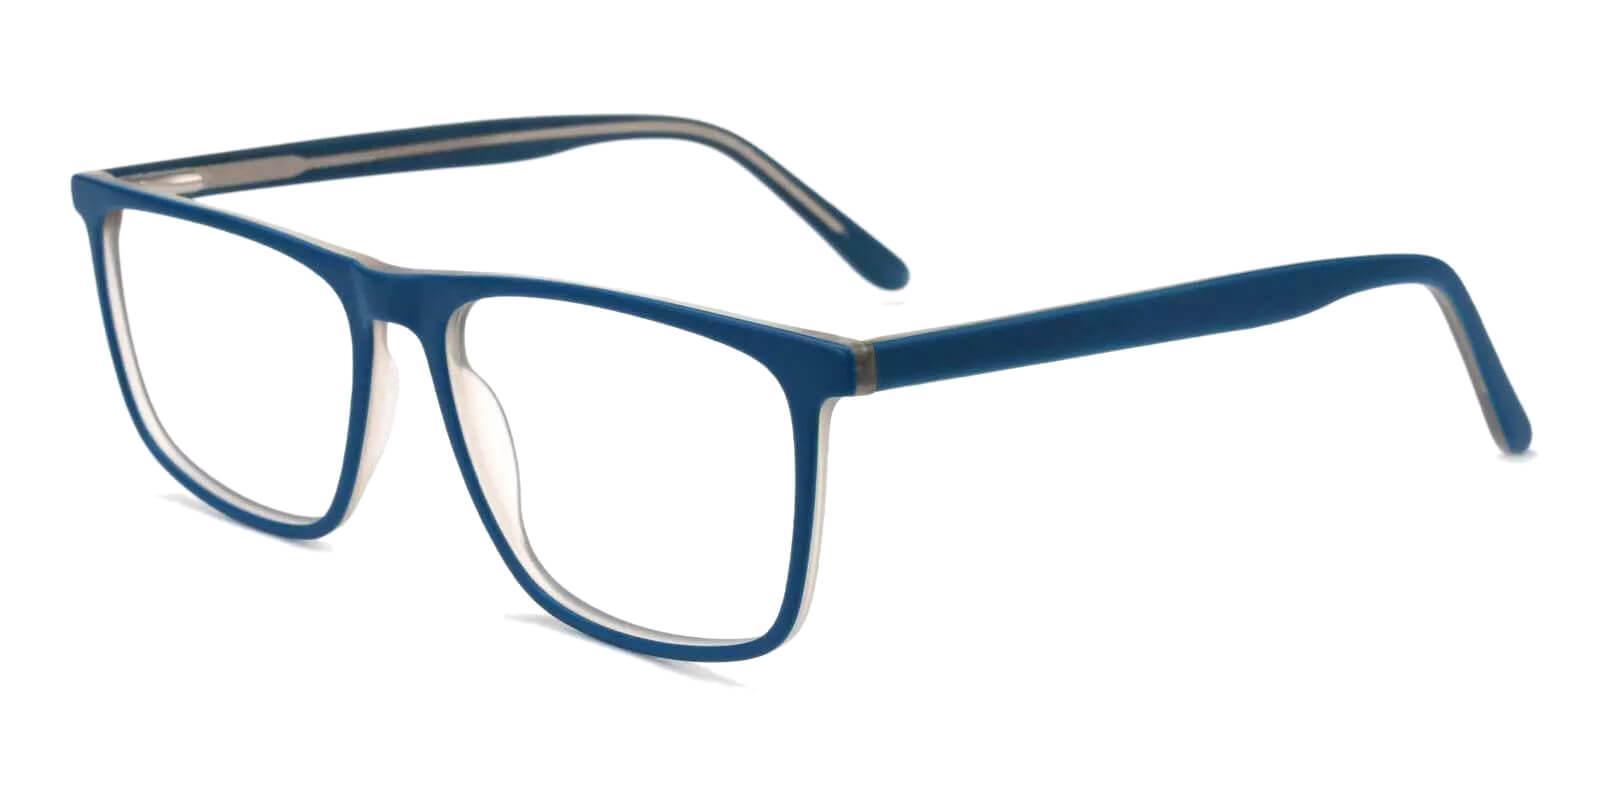 Doris Blue Acetate Eyeglasses , Fashion , SpringHinges , UniversalBridgeFit Frames from ABBE Glasses